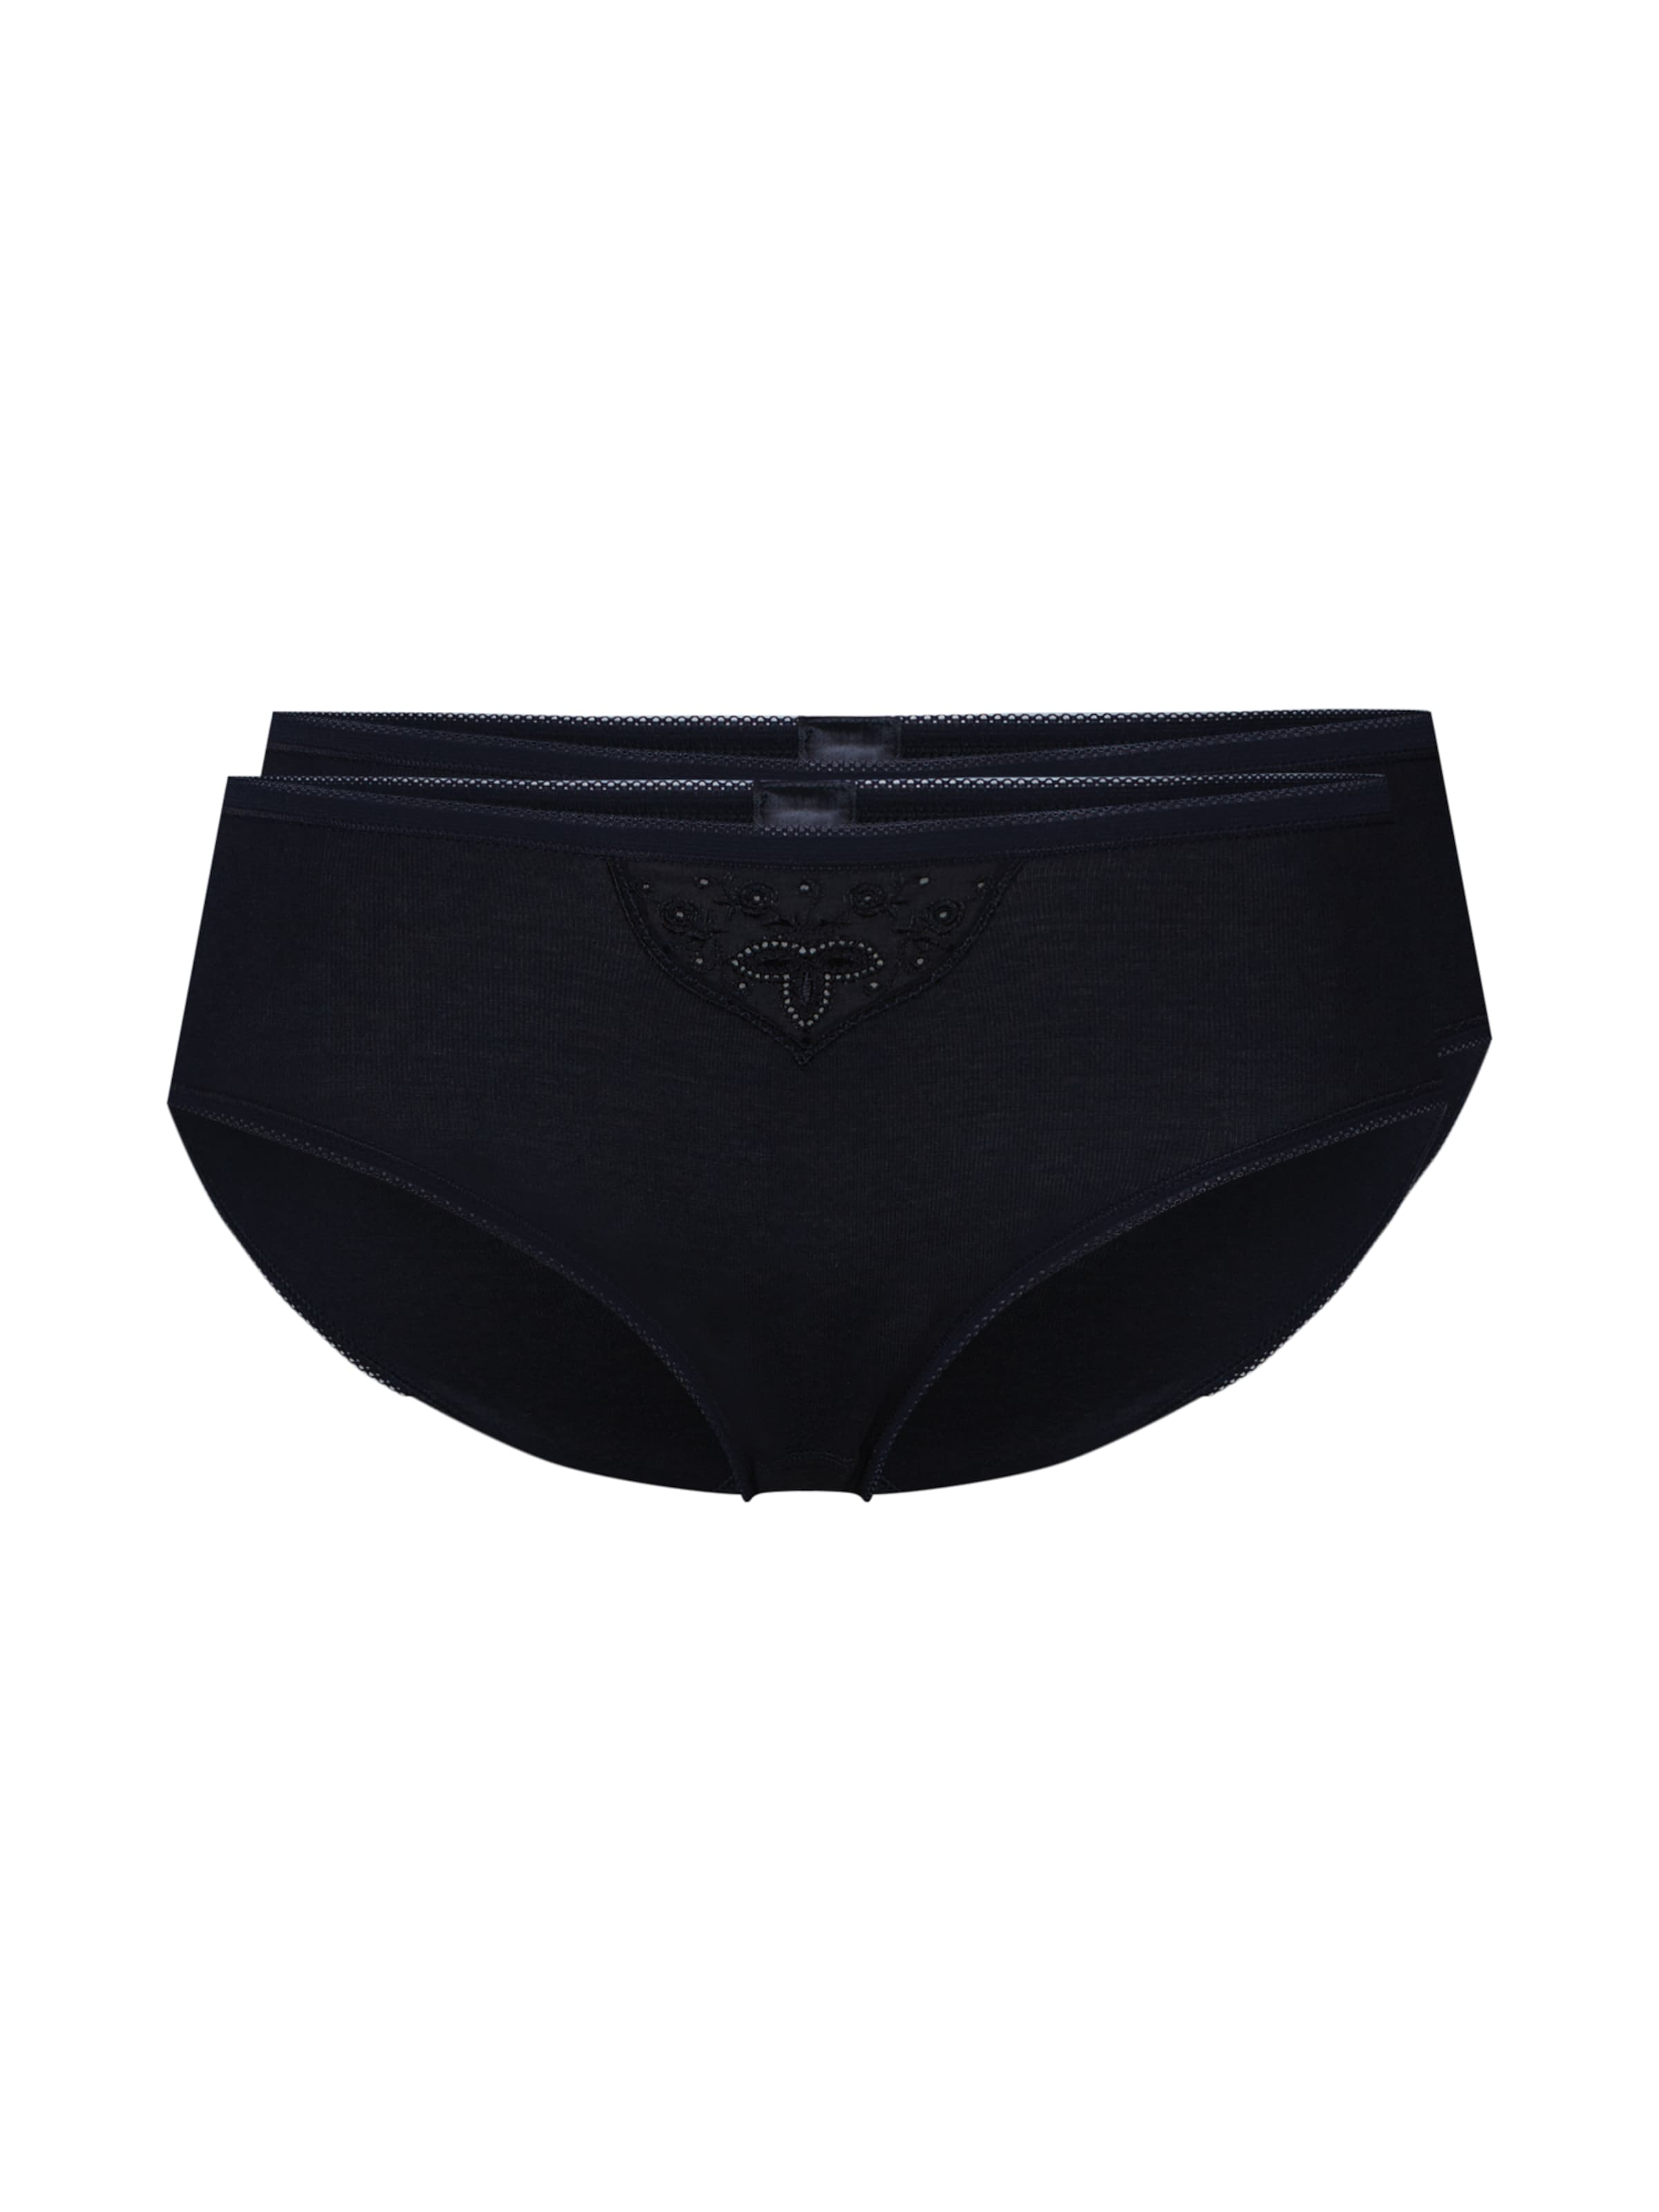 En Culotte 'cotton Essentials' Schiesser Noir QhrdCst